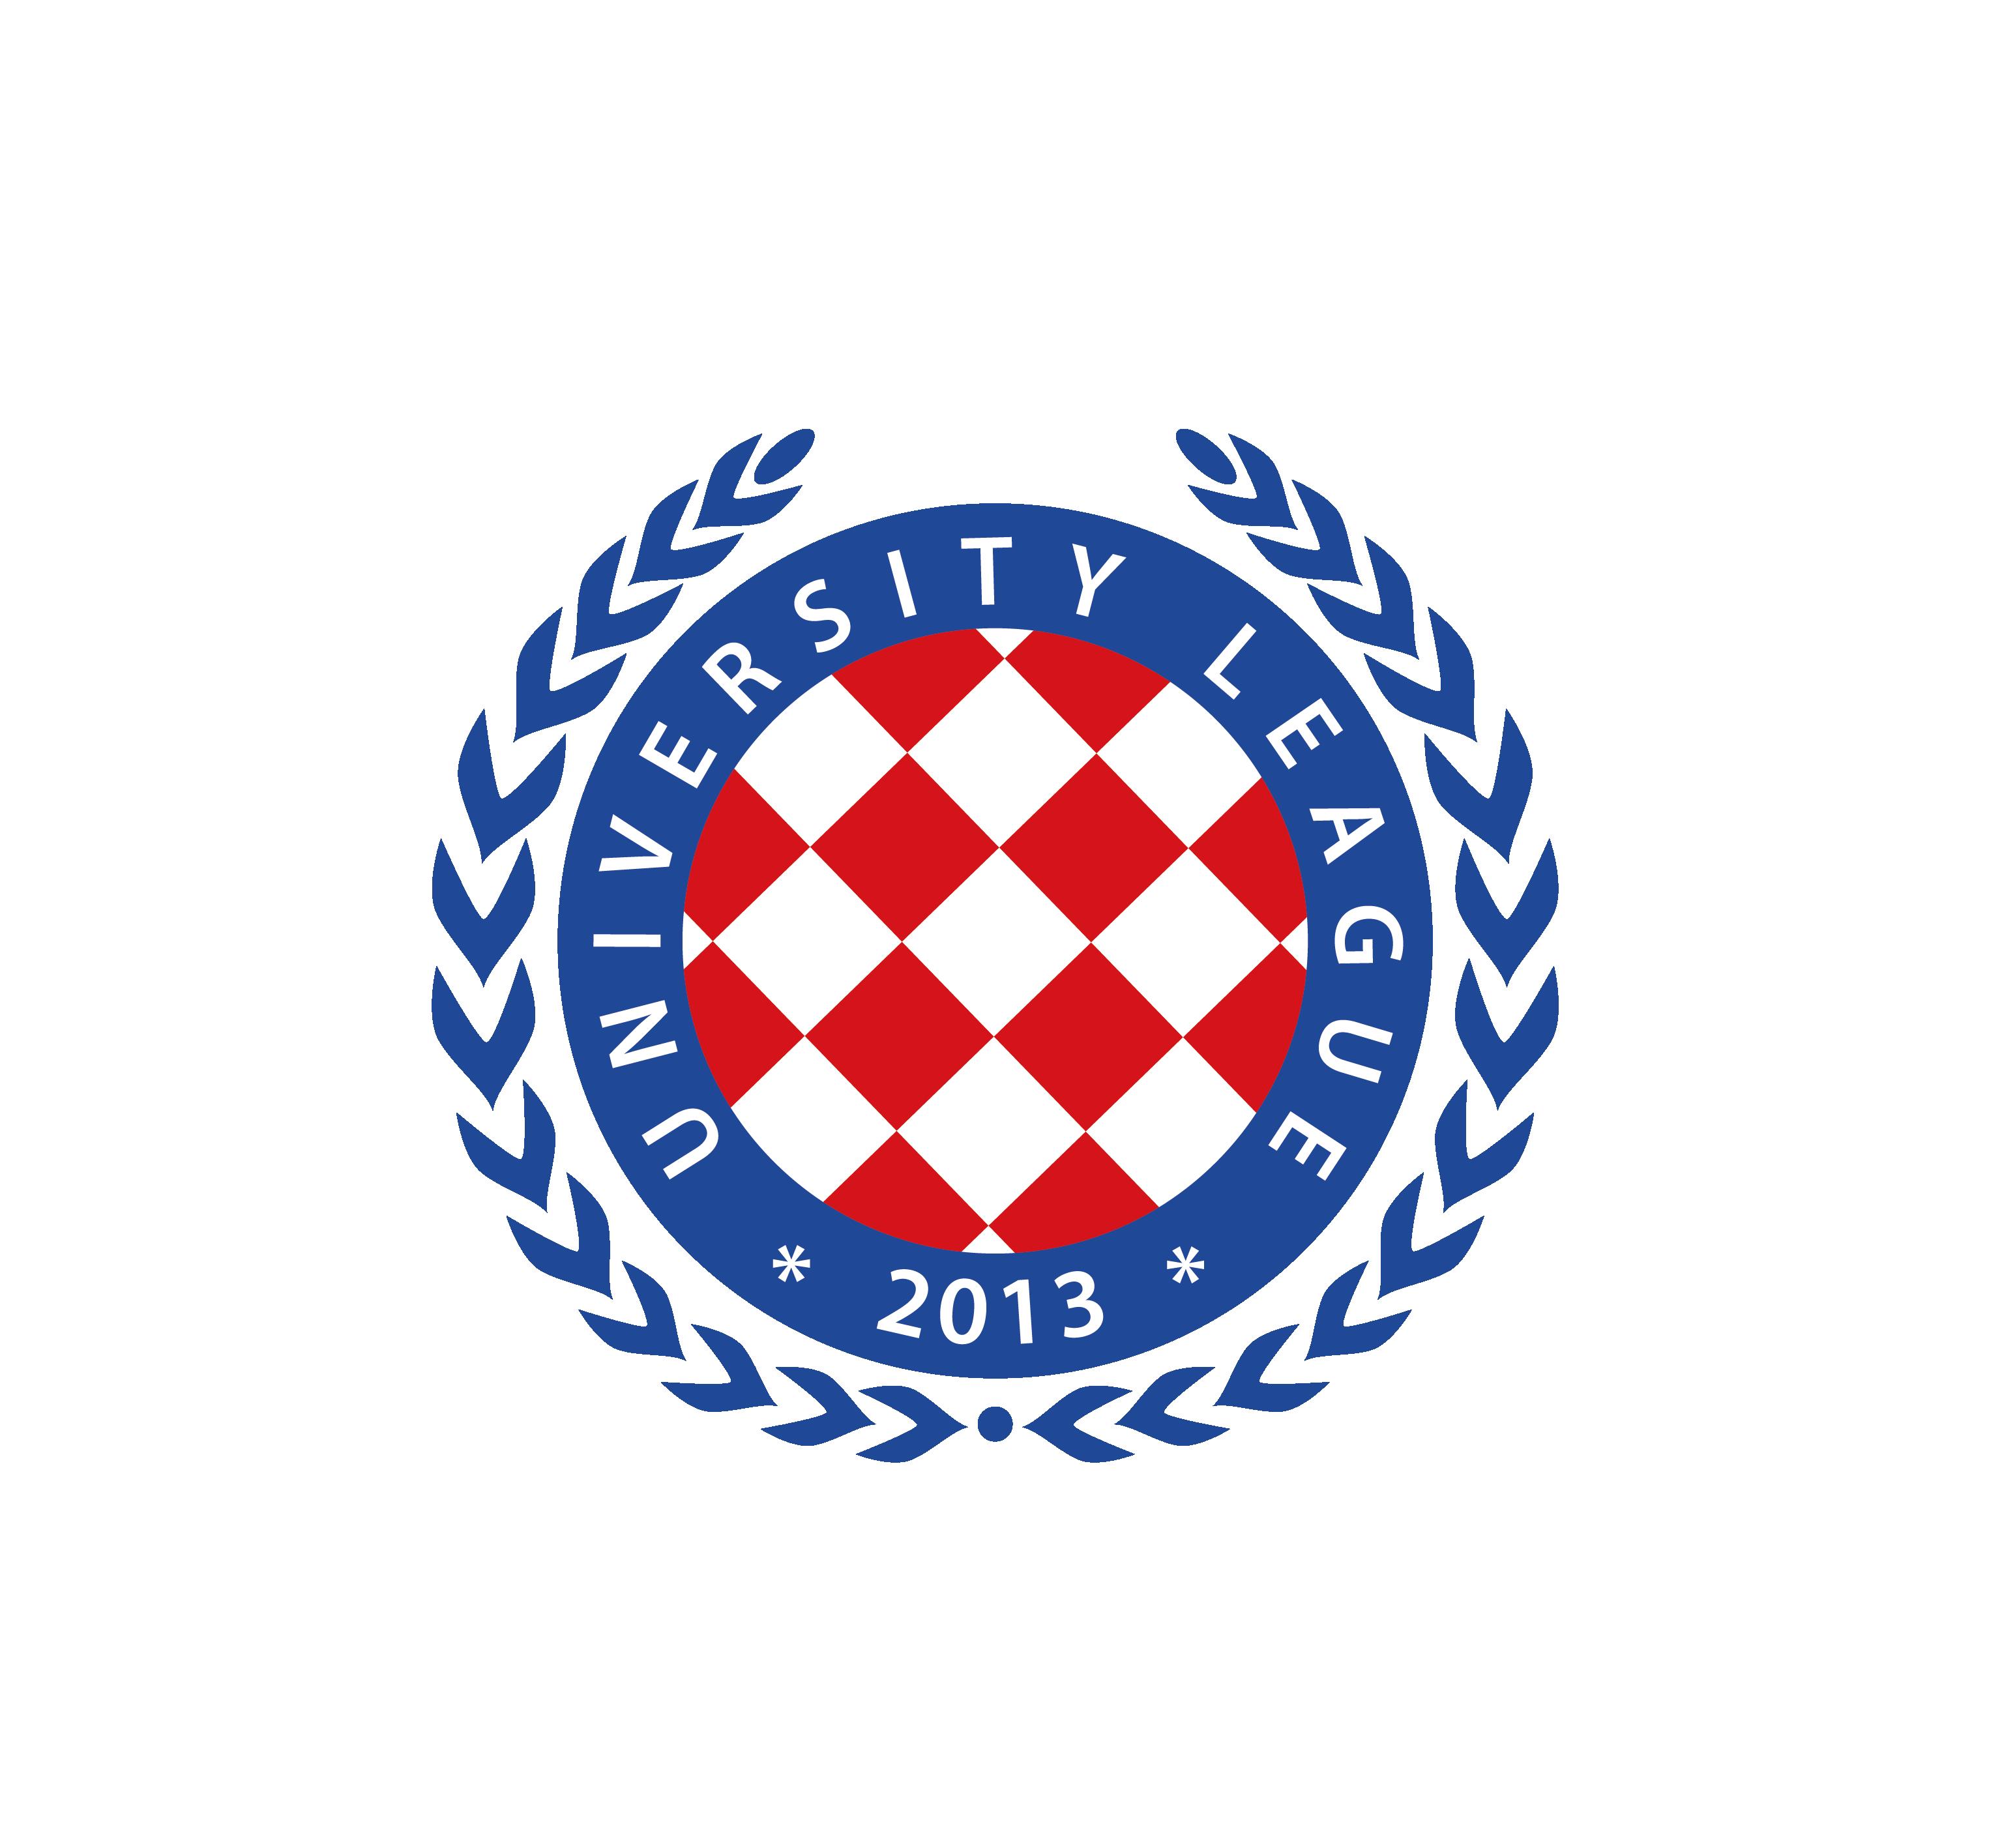 FK Bez nas nezacnou